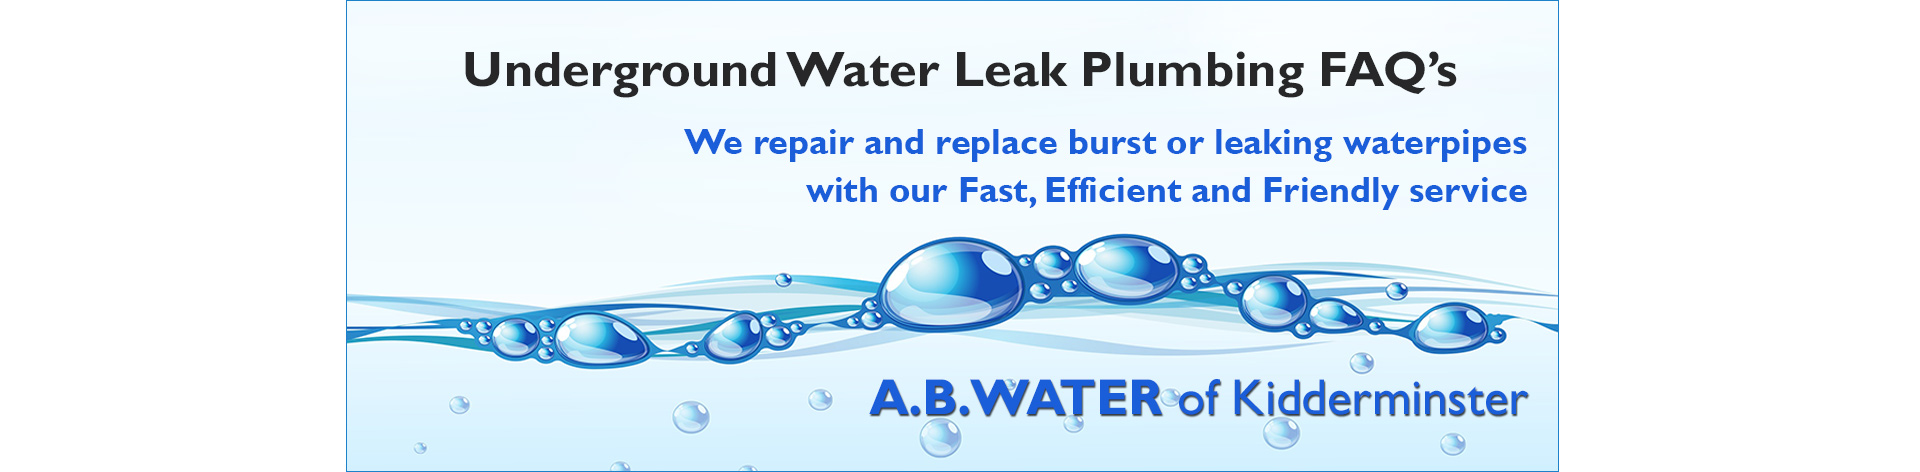 underground-water-leak-plumbing-faqs